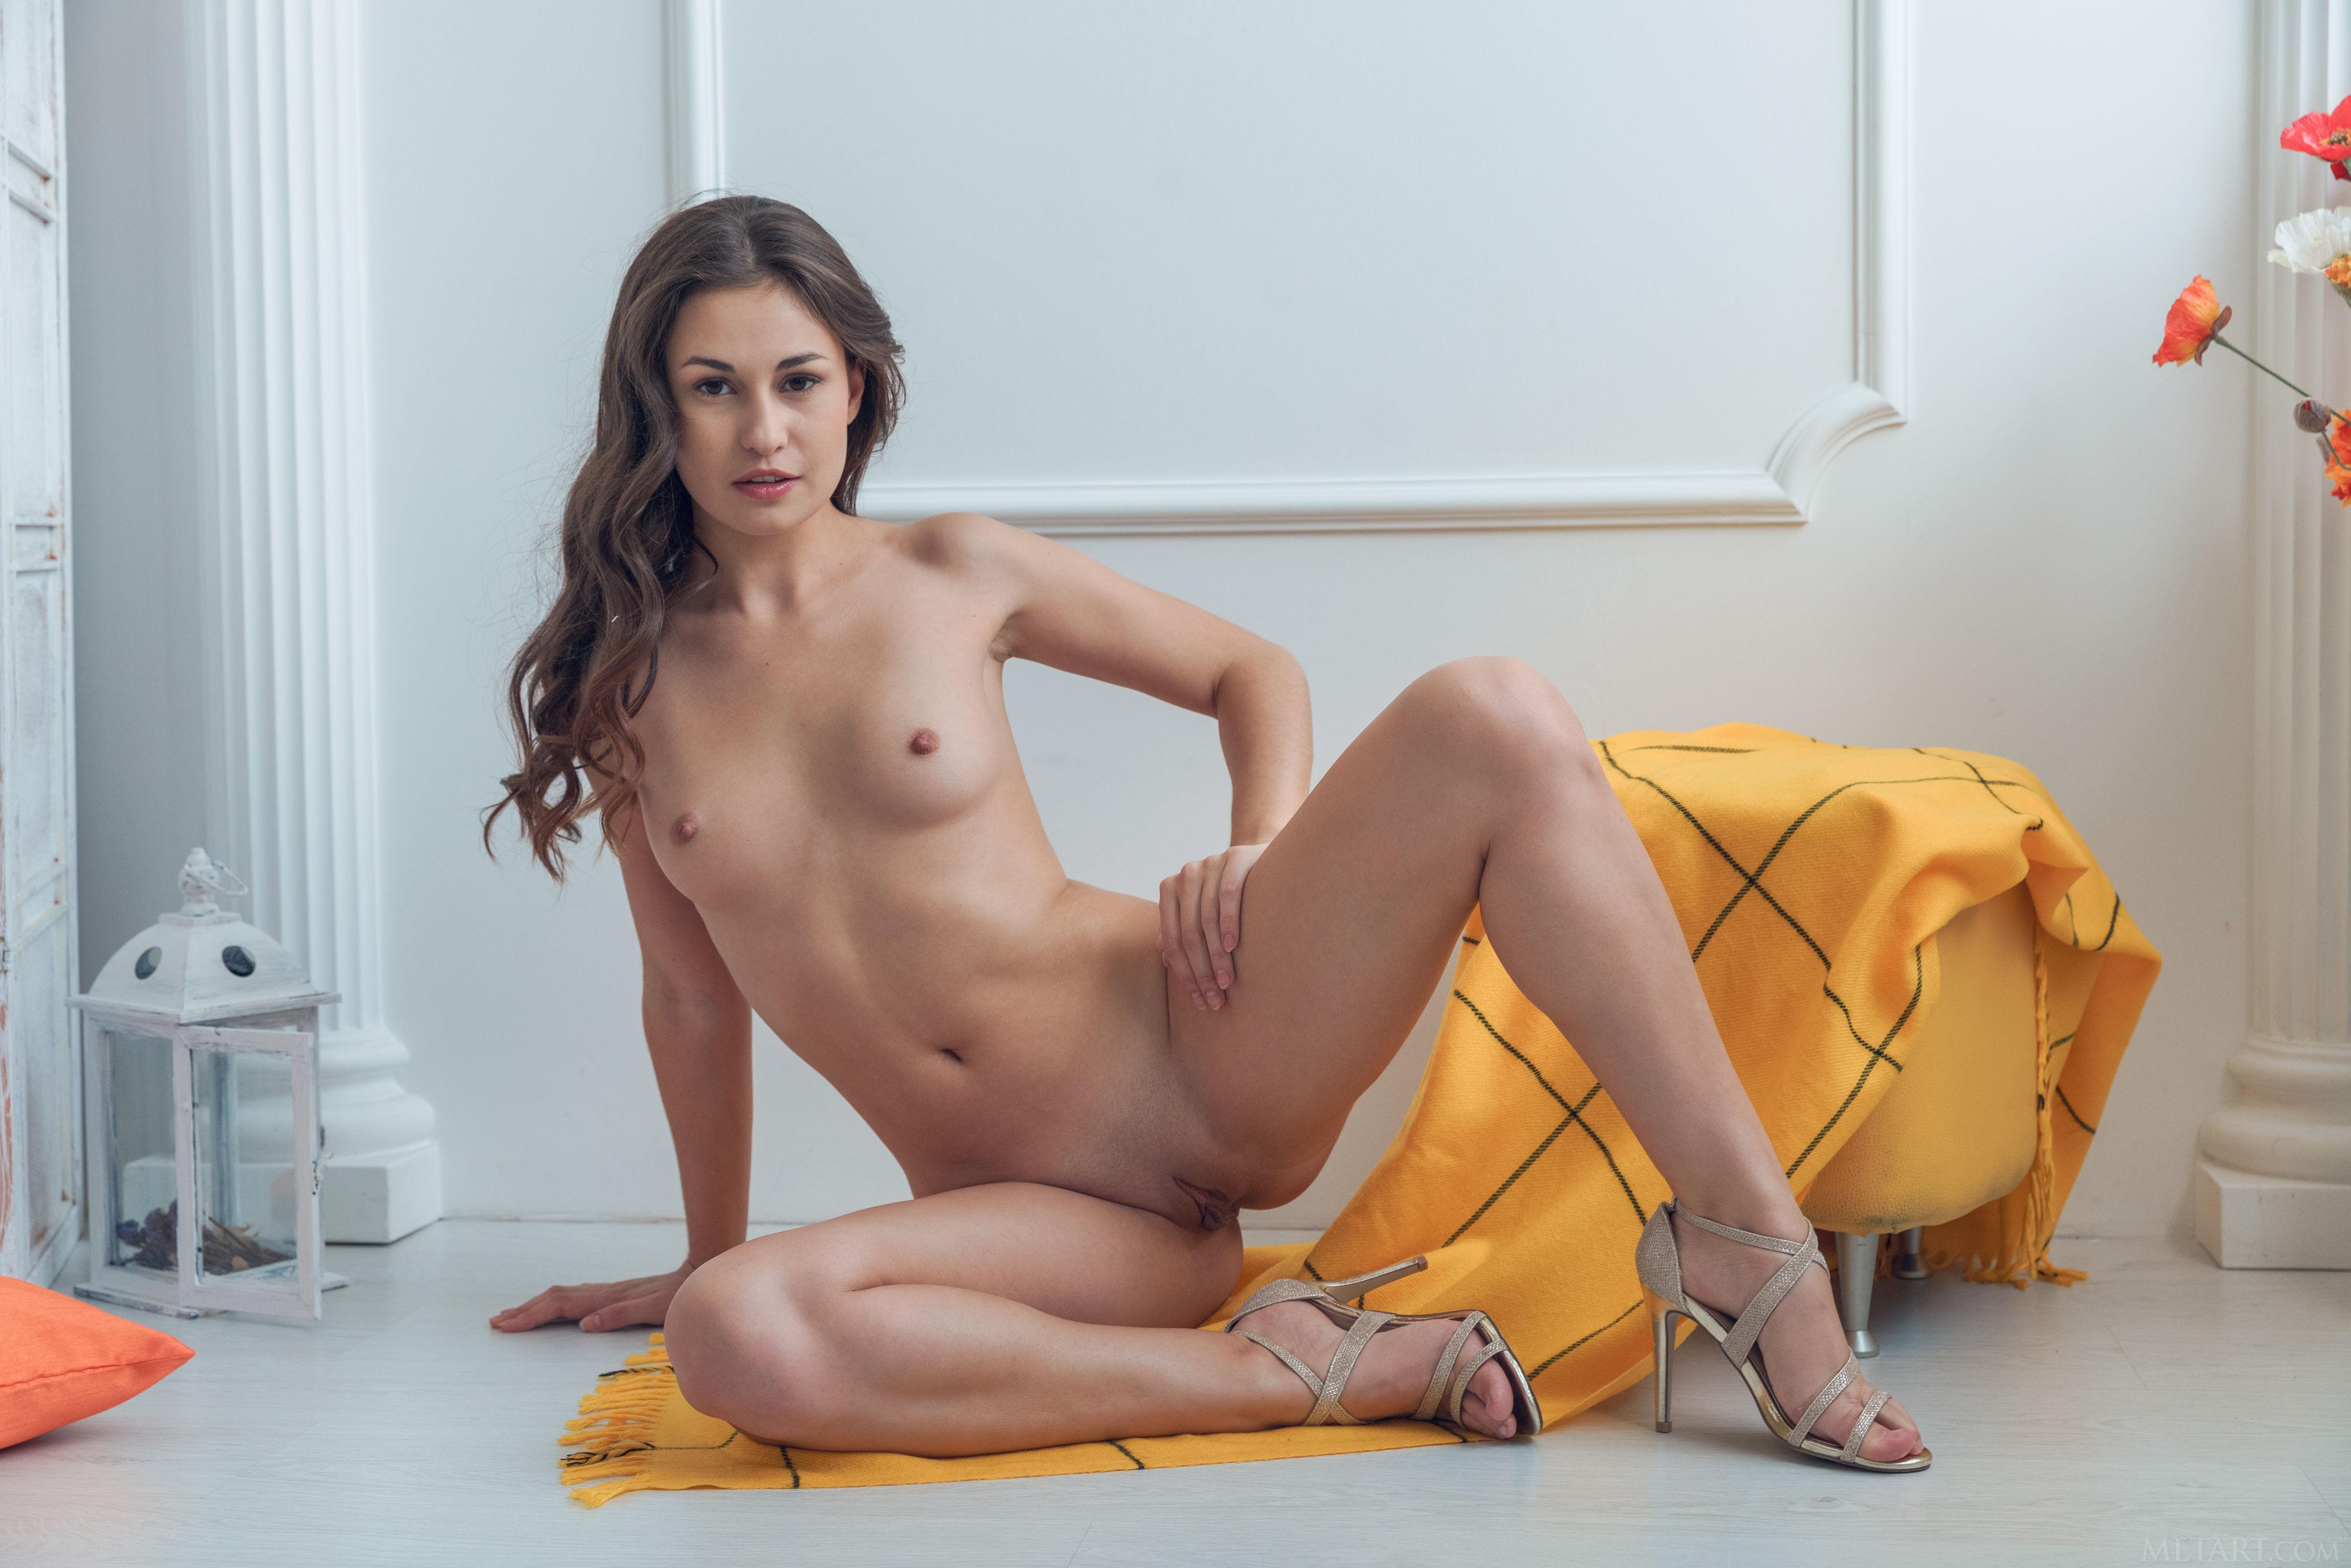 обои Lilian A, модель, красотка, голая картинки фото